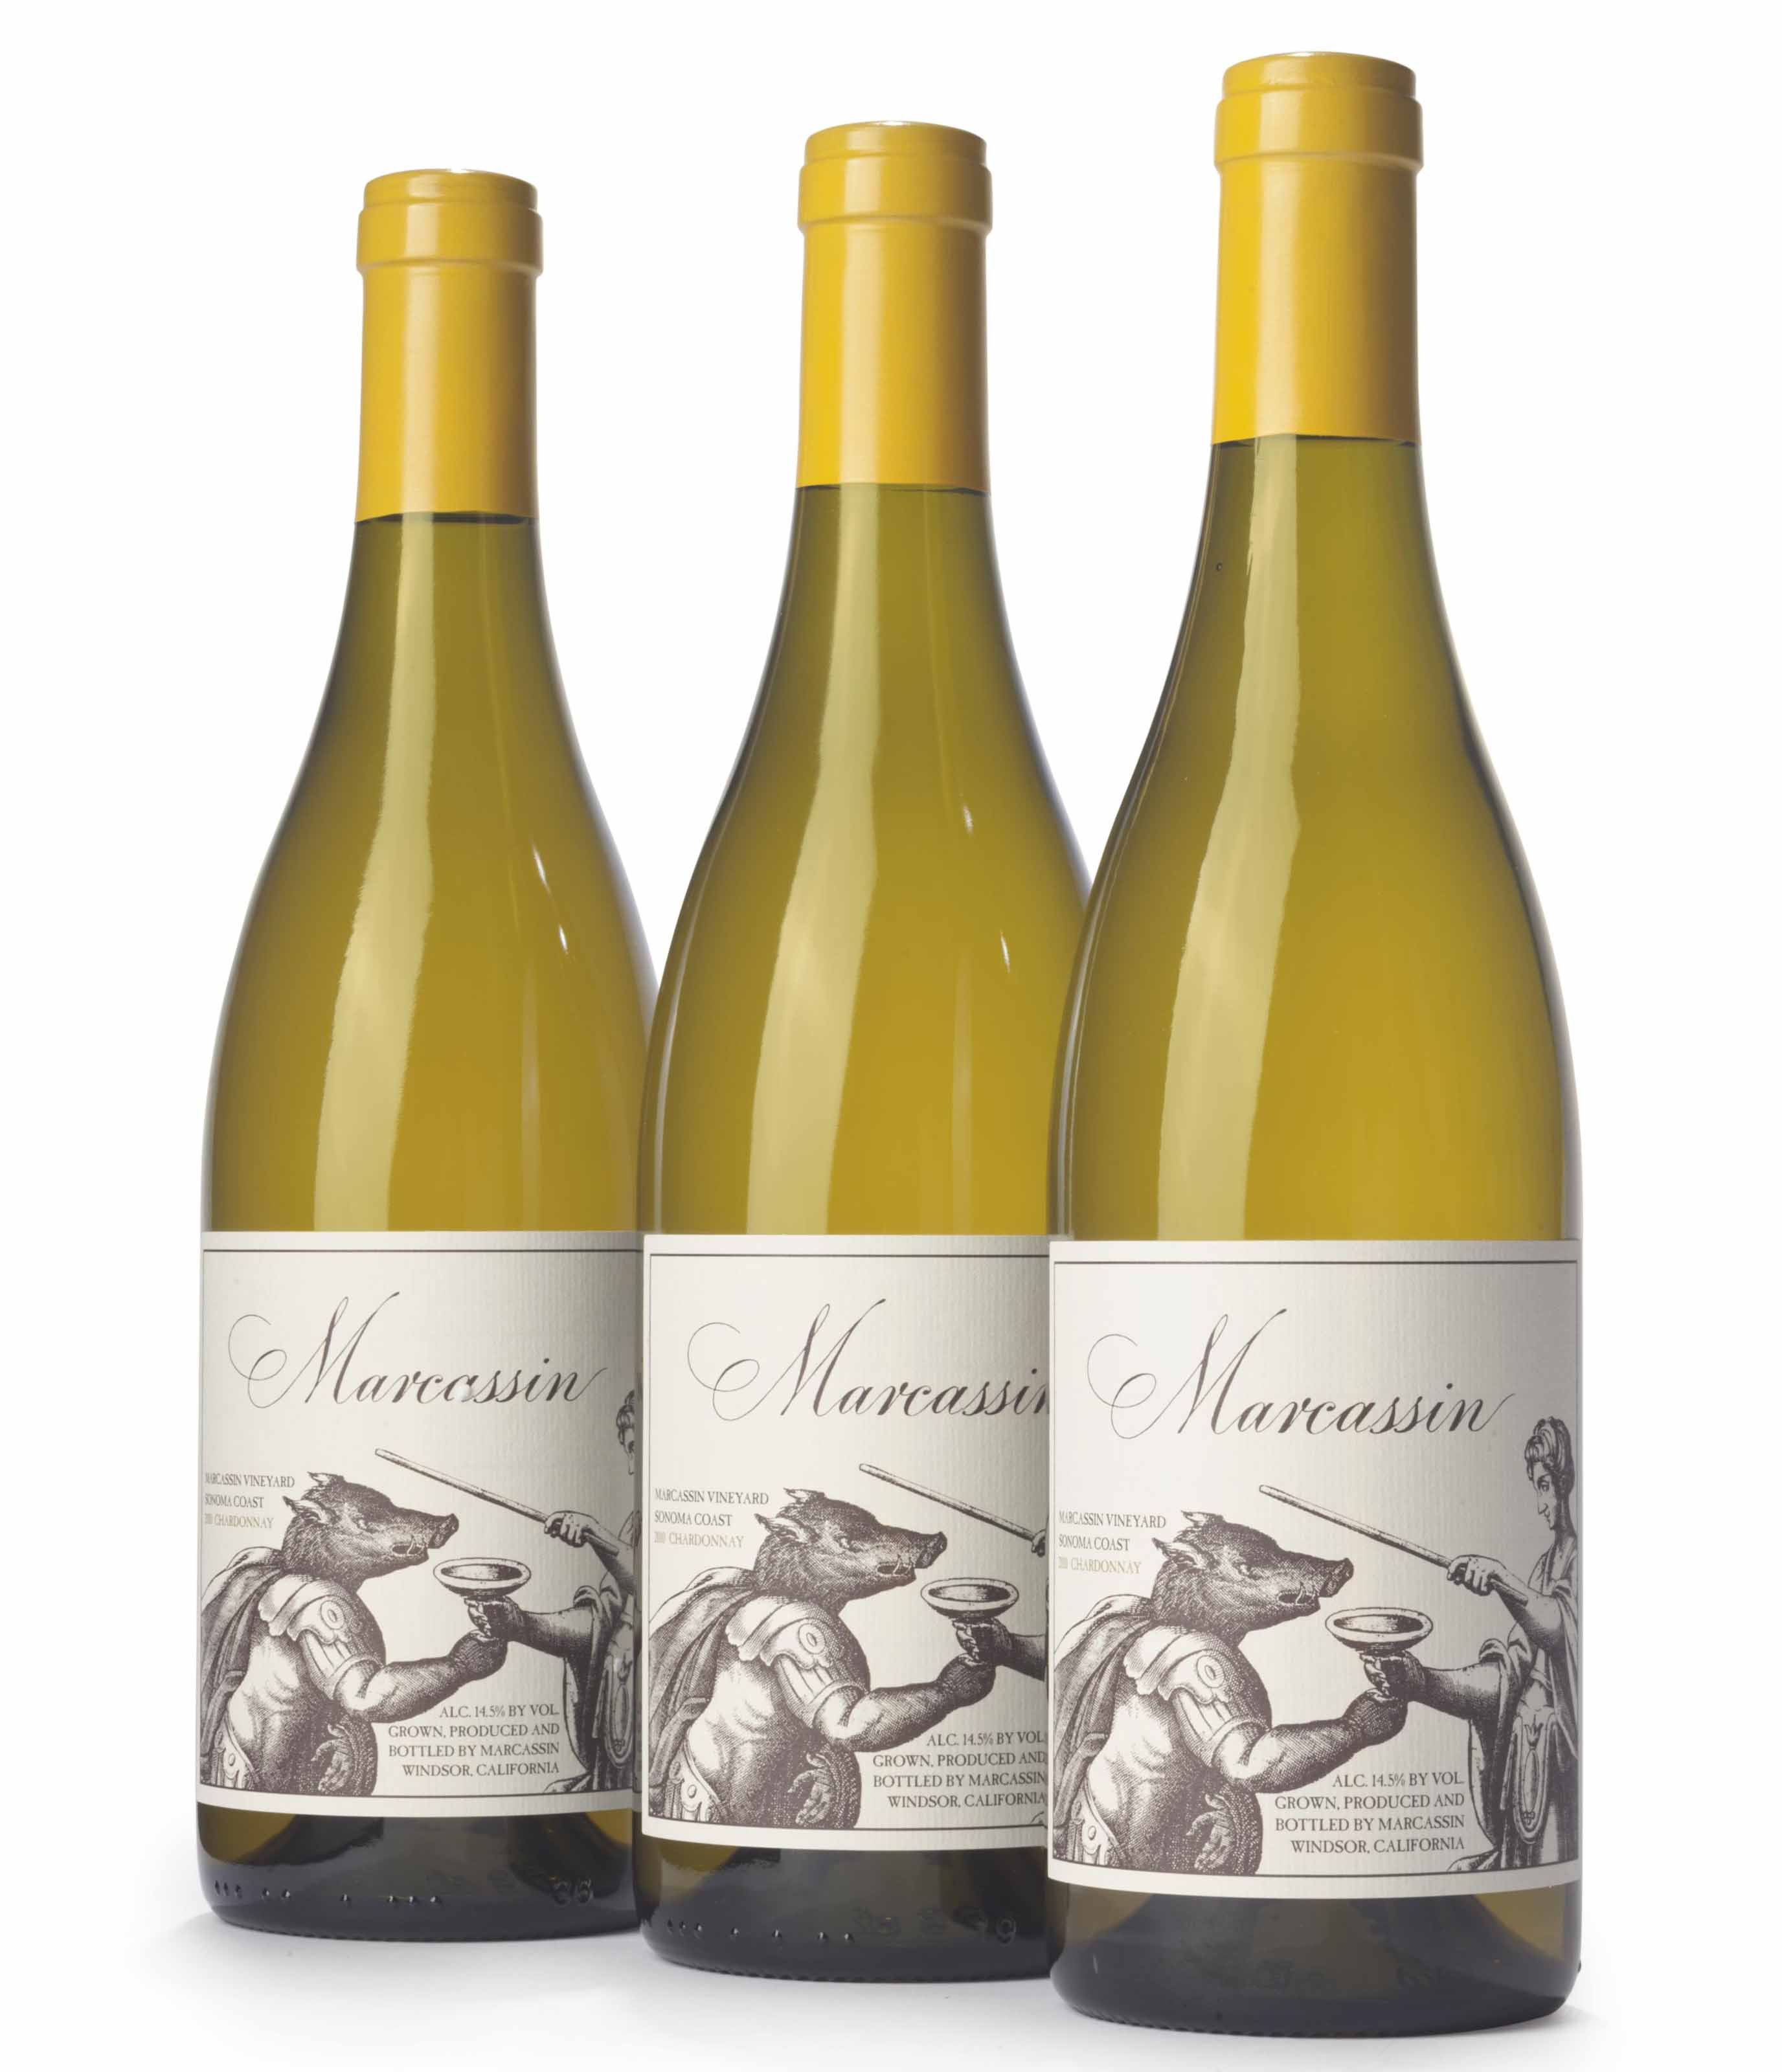 Marcassin, Marcassin Vineyard, Chardonnay 2010